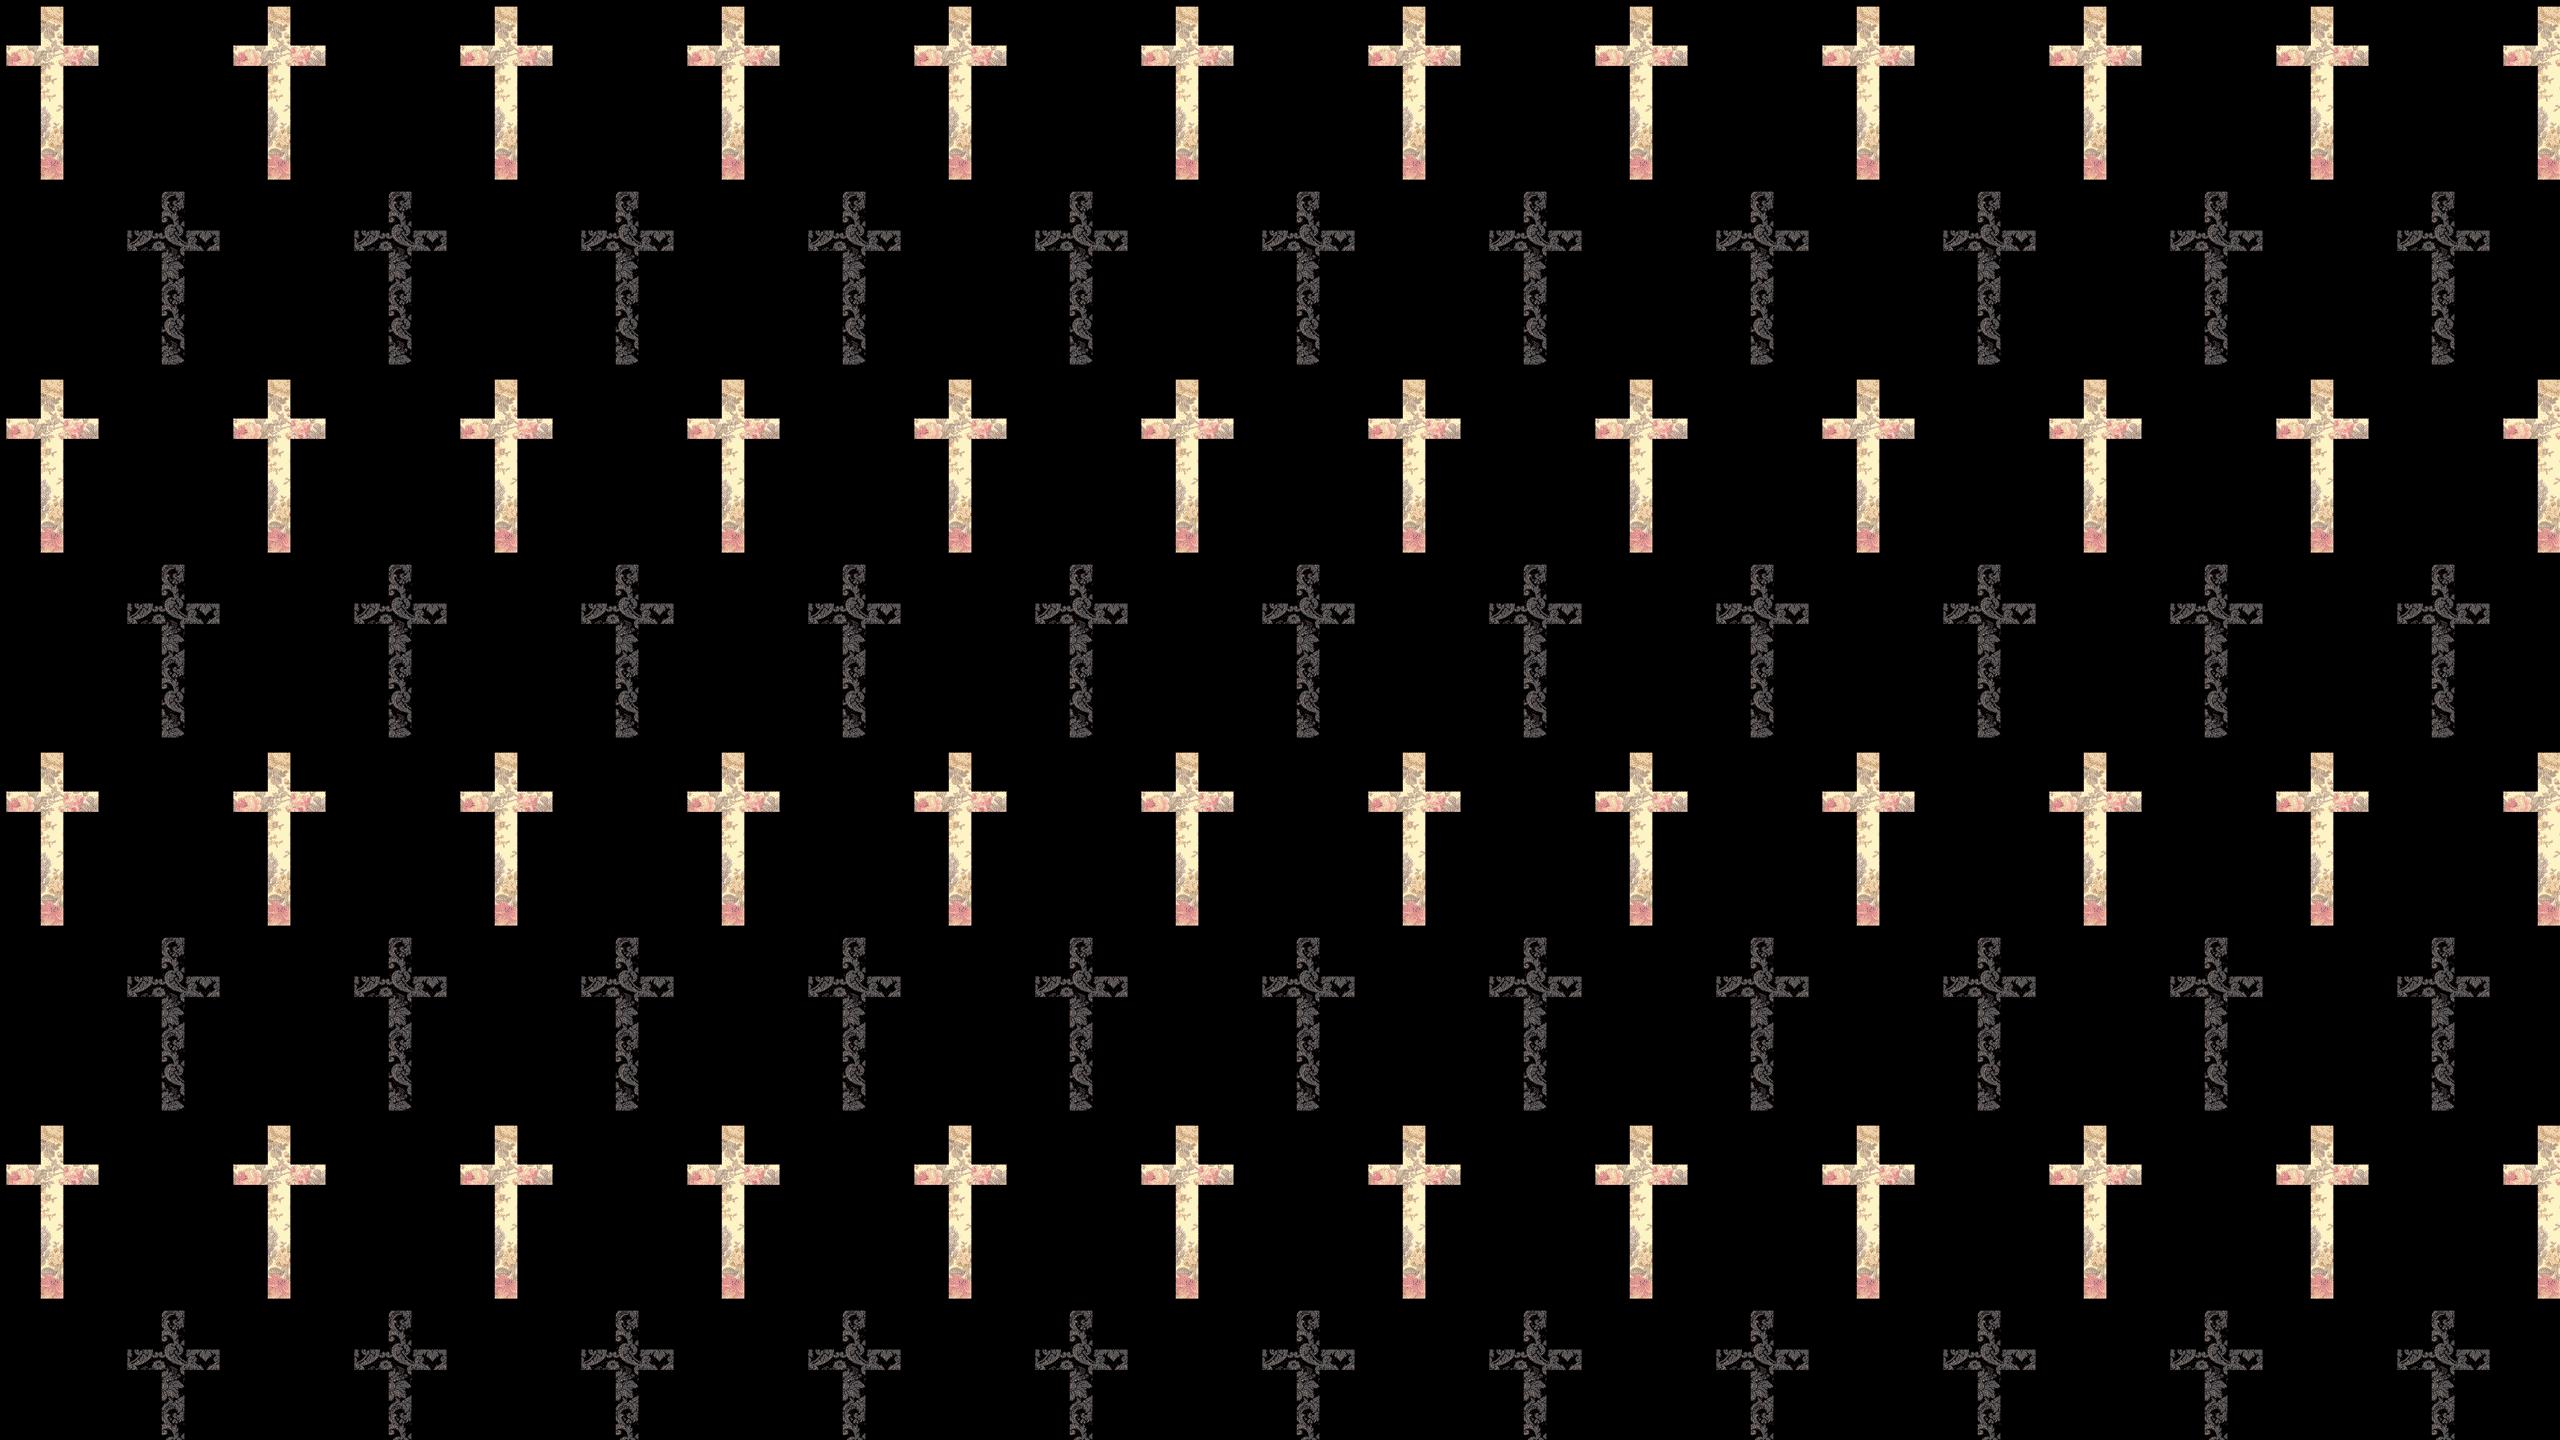 Hipster Cross Tumblr Theme Hipster Cross Theme for Tumblrcom 2560x1440